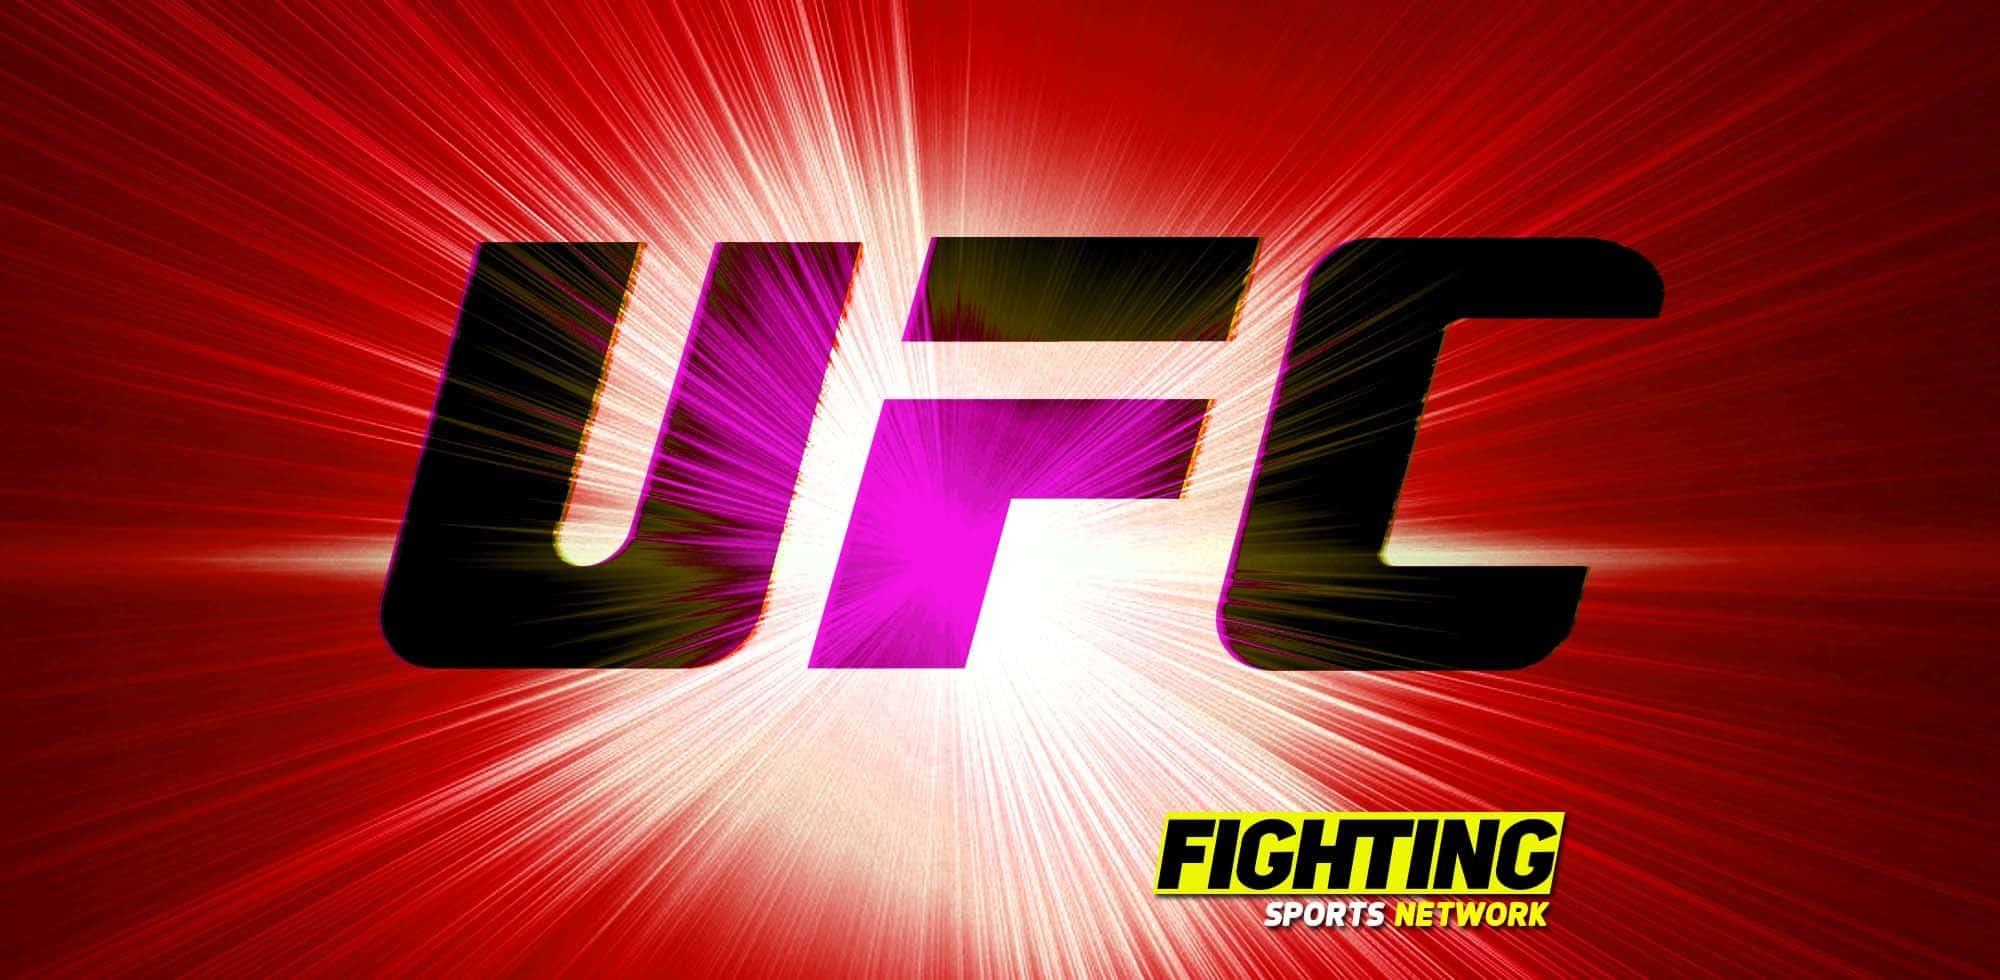 UFC MMA Noticias UFC Noticias MMA